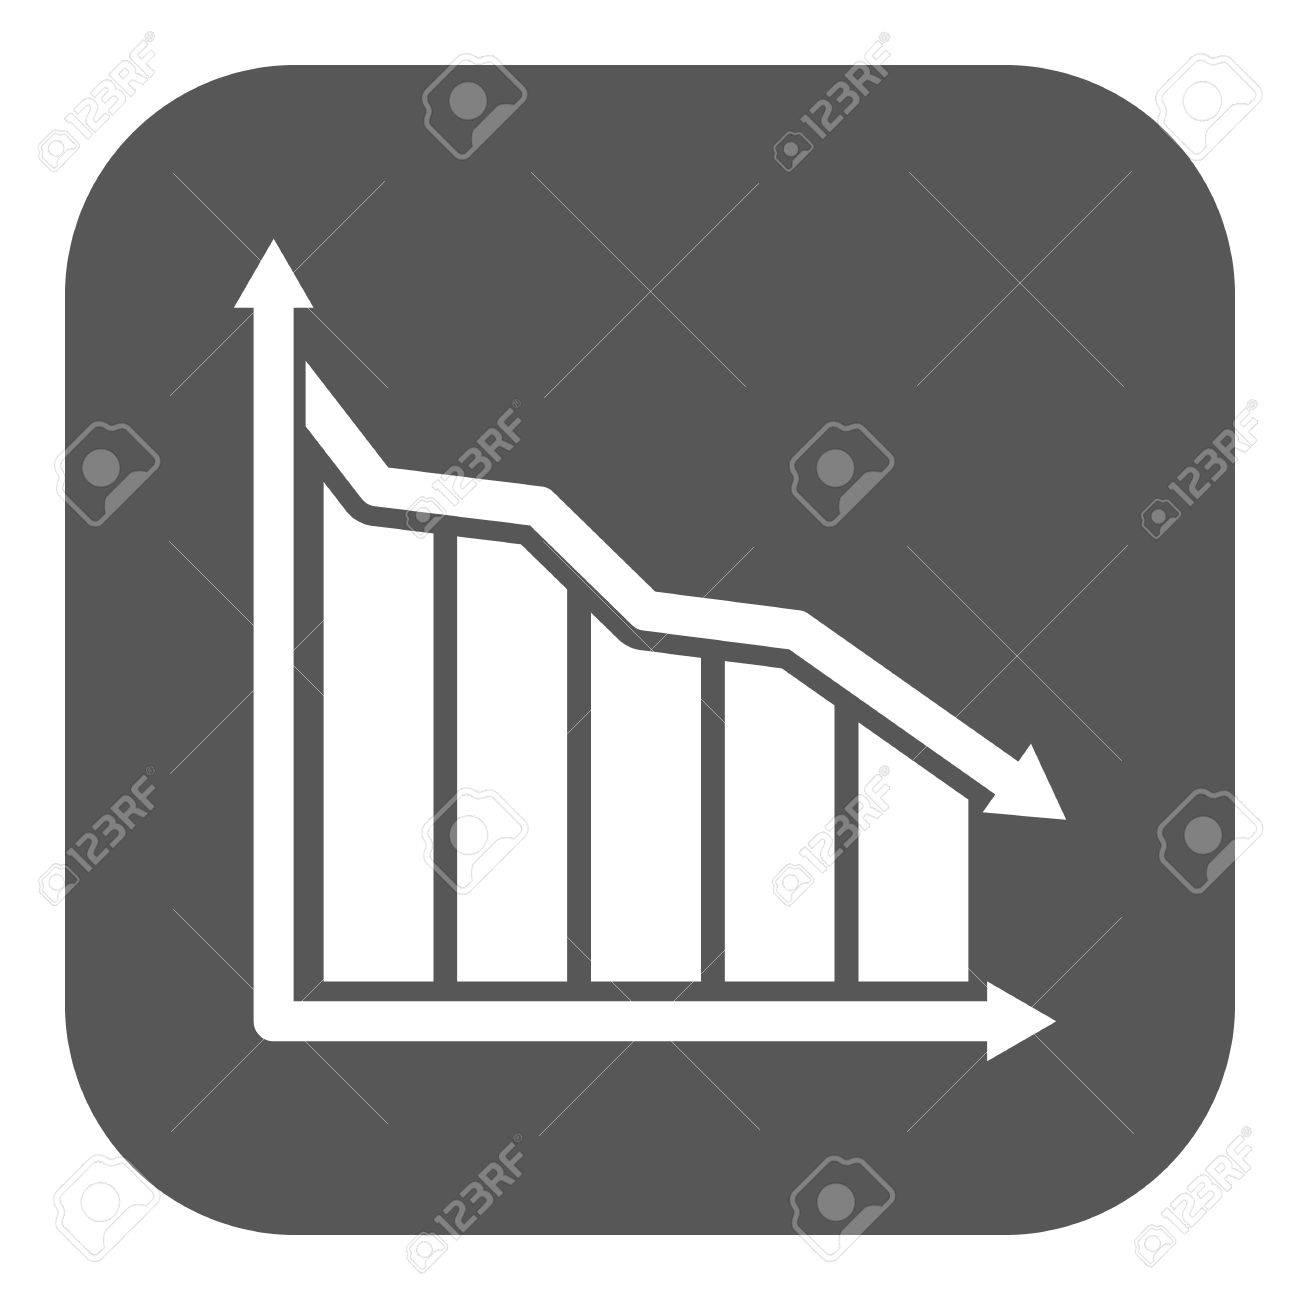 loss reduction